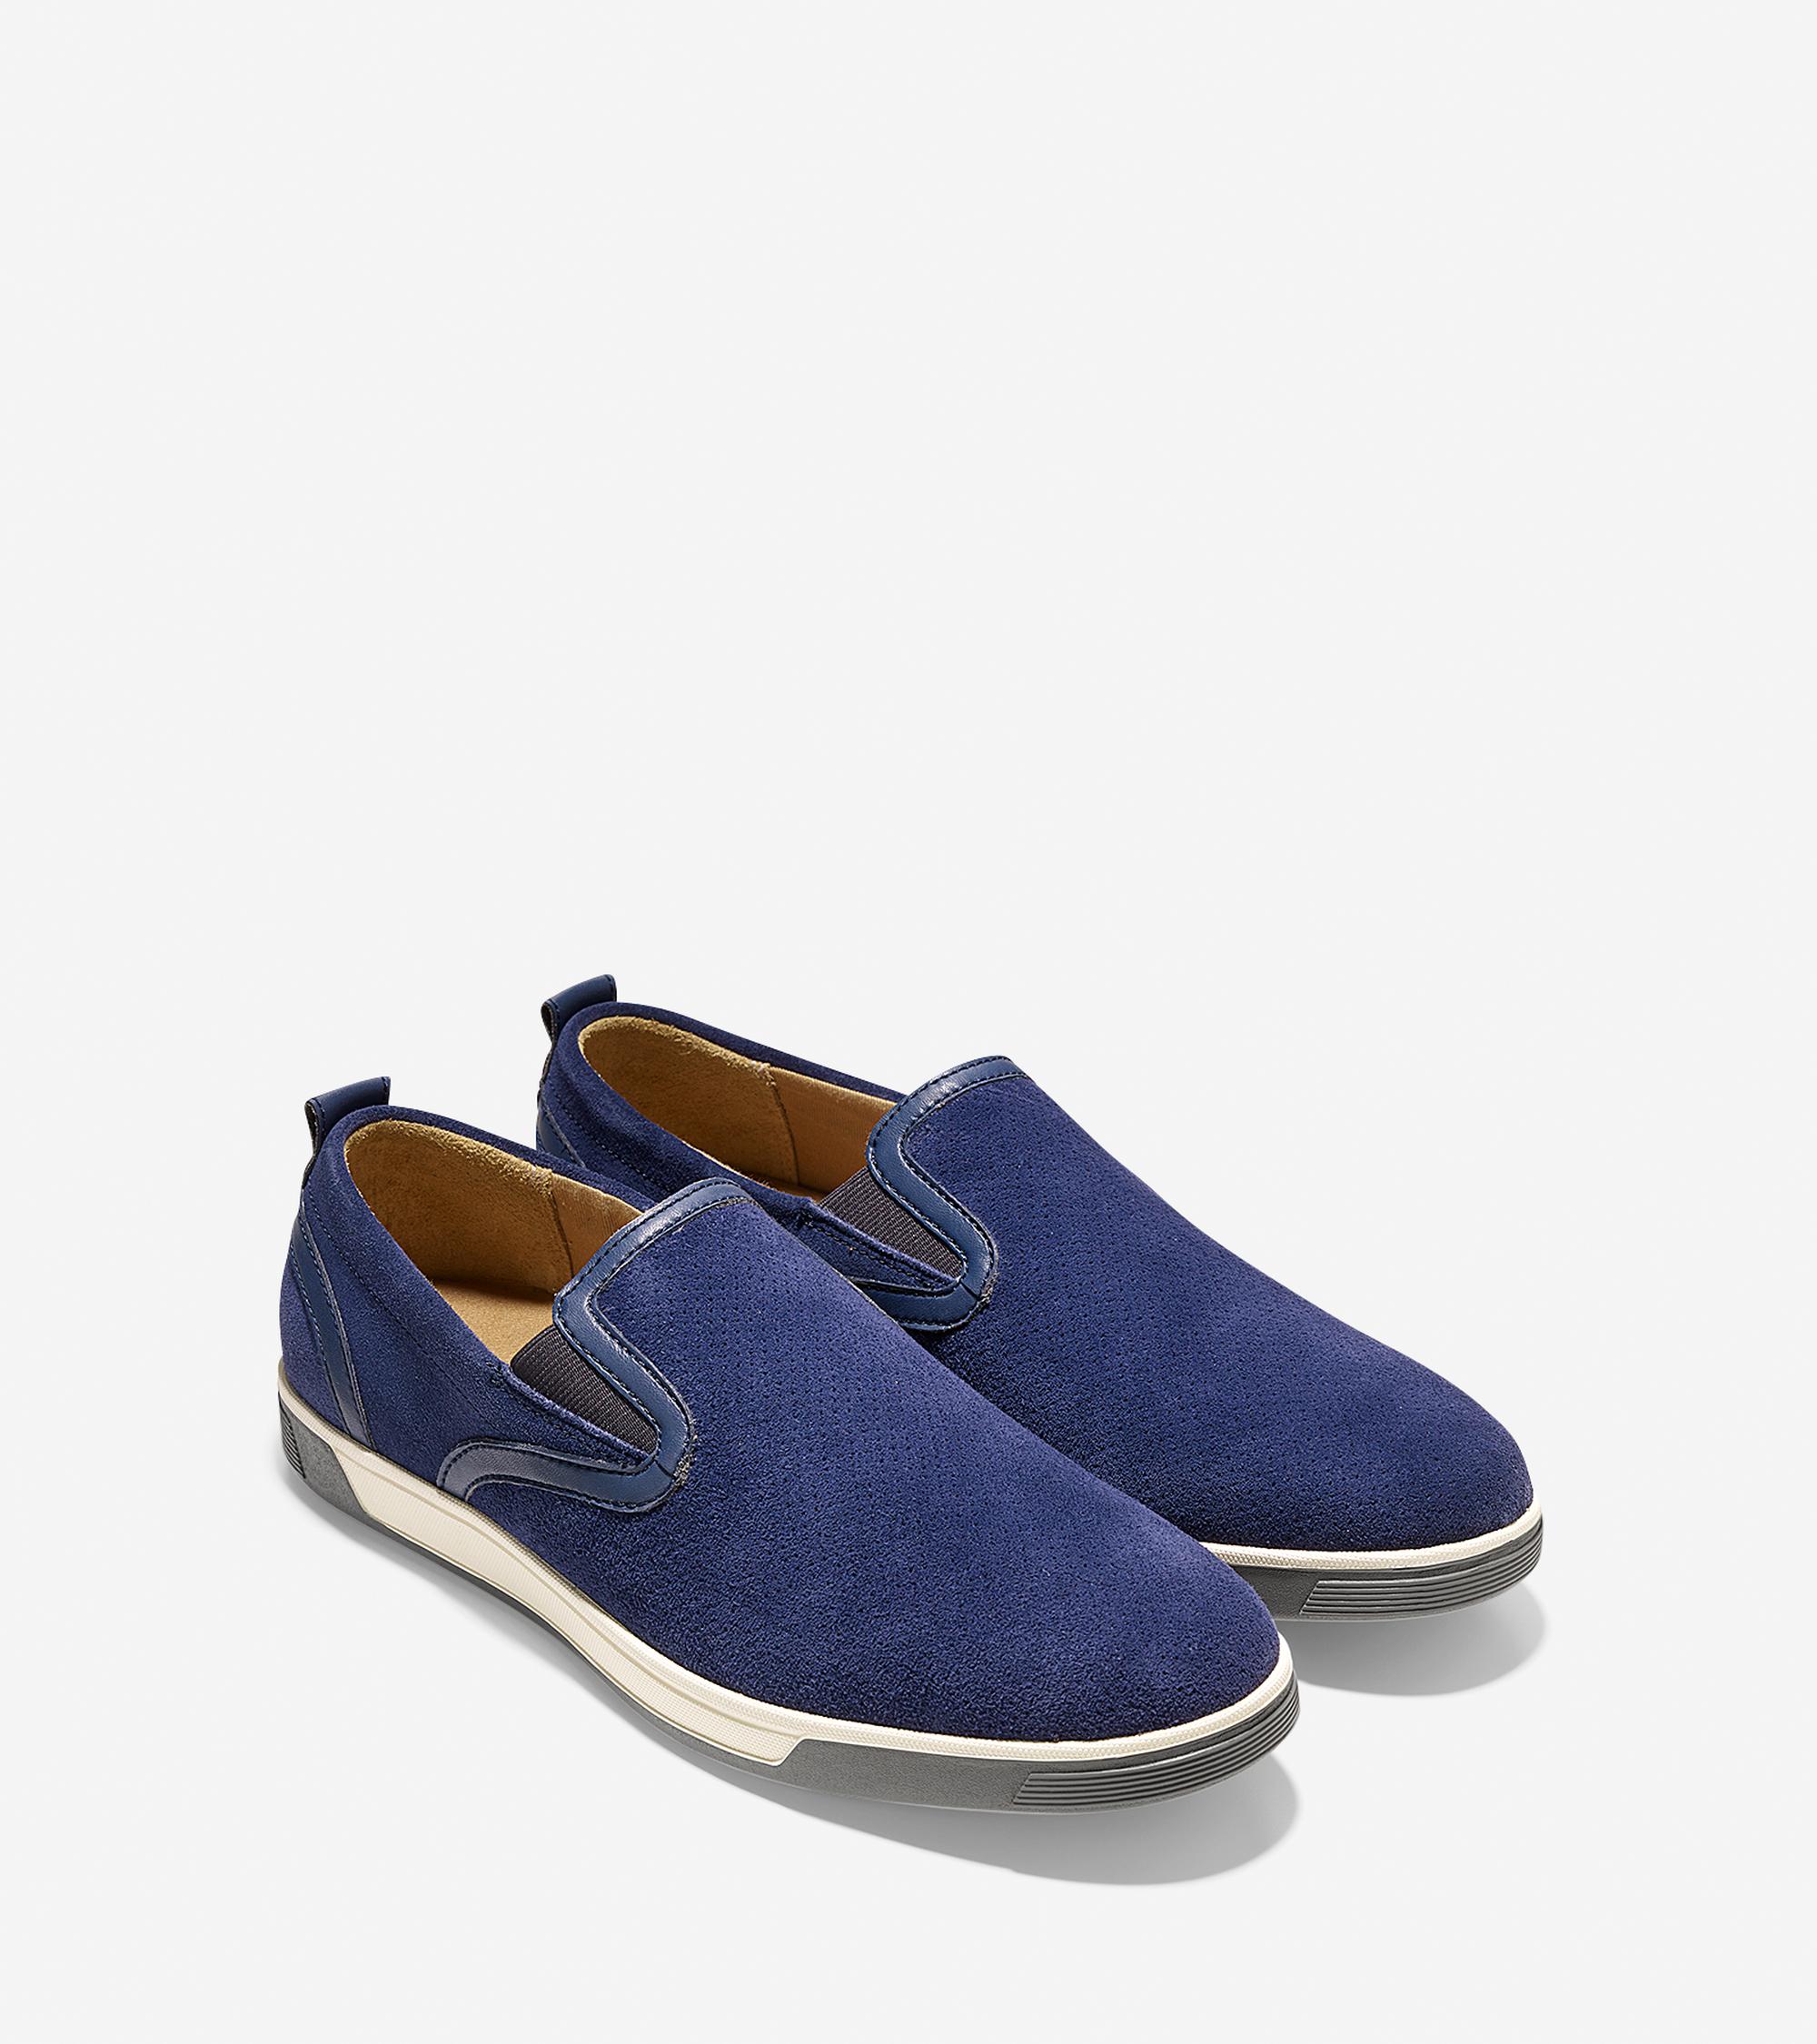 Cole Haan Quincy Slip On In Blue For Men Blazer Blue